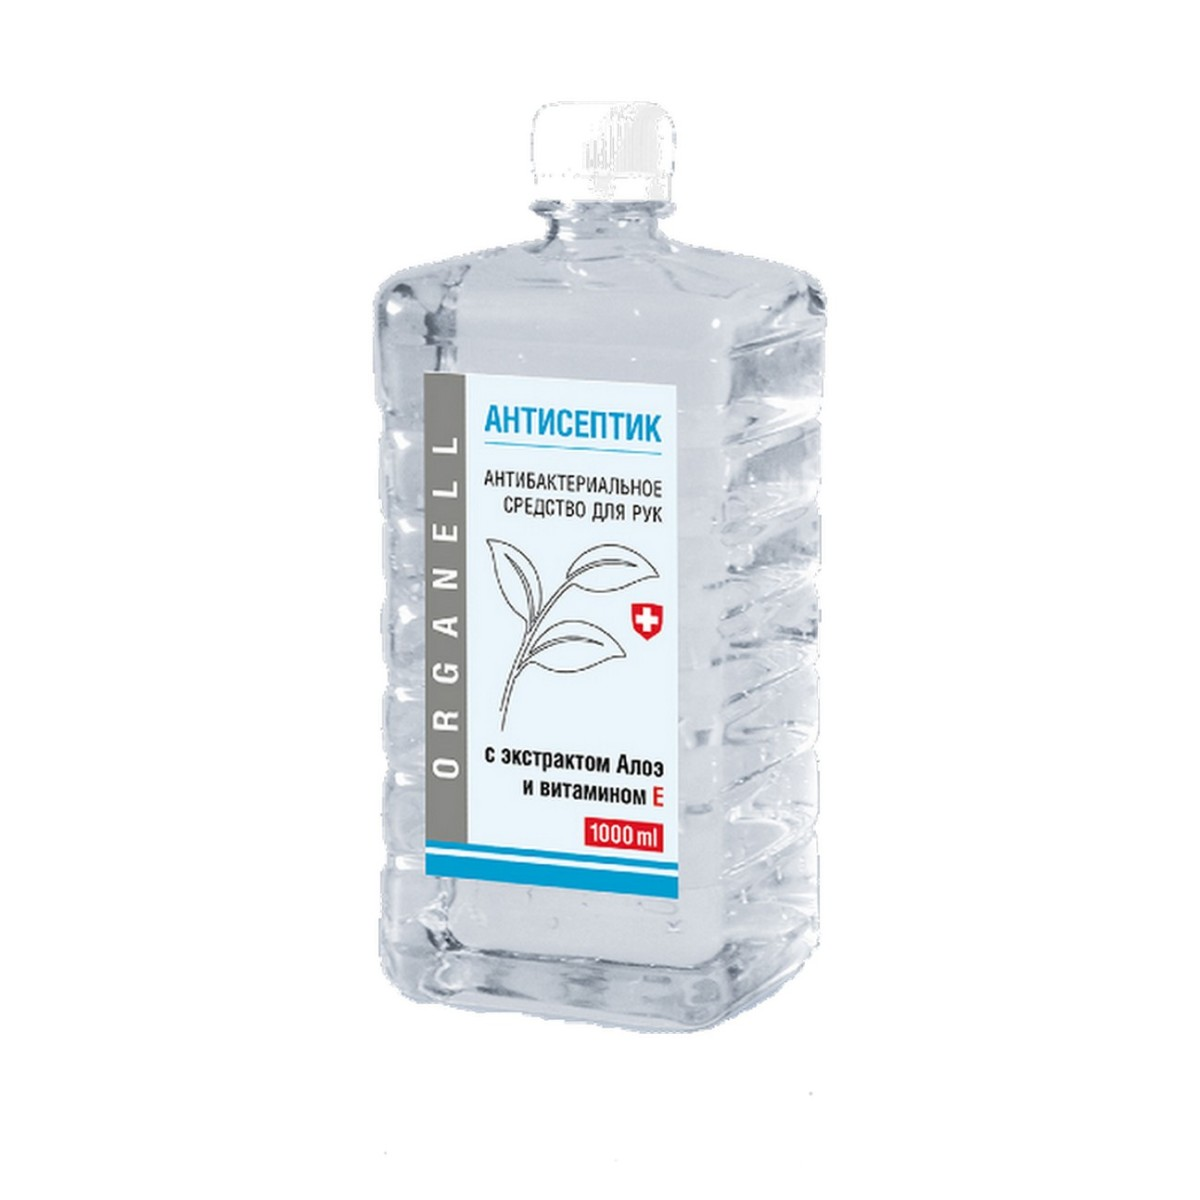 Антибактериальное средство для рук ORGANELL 1 л